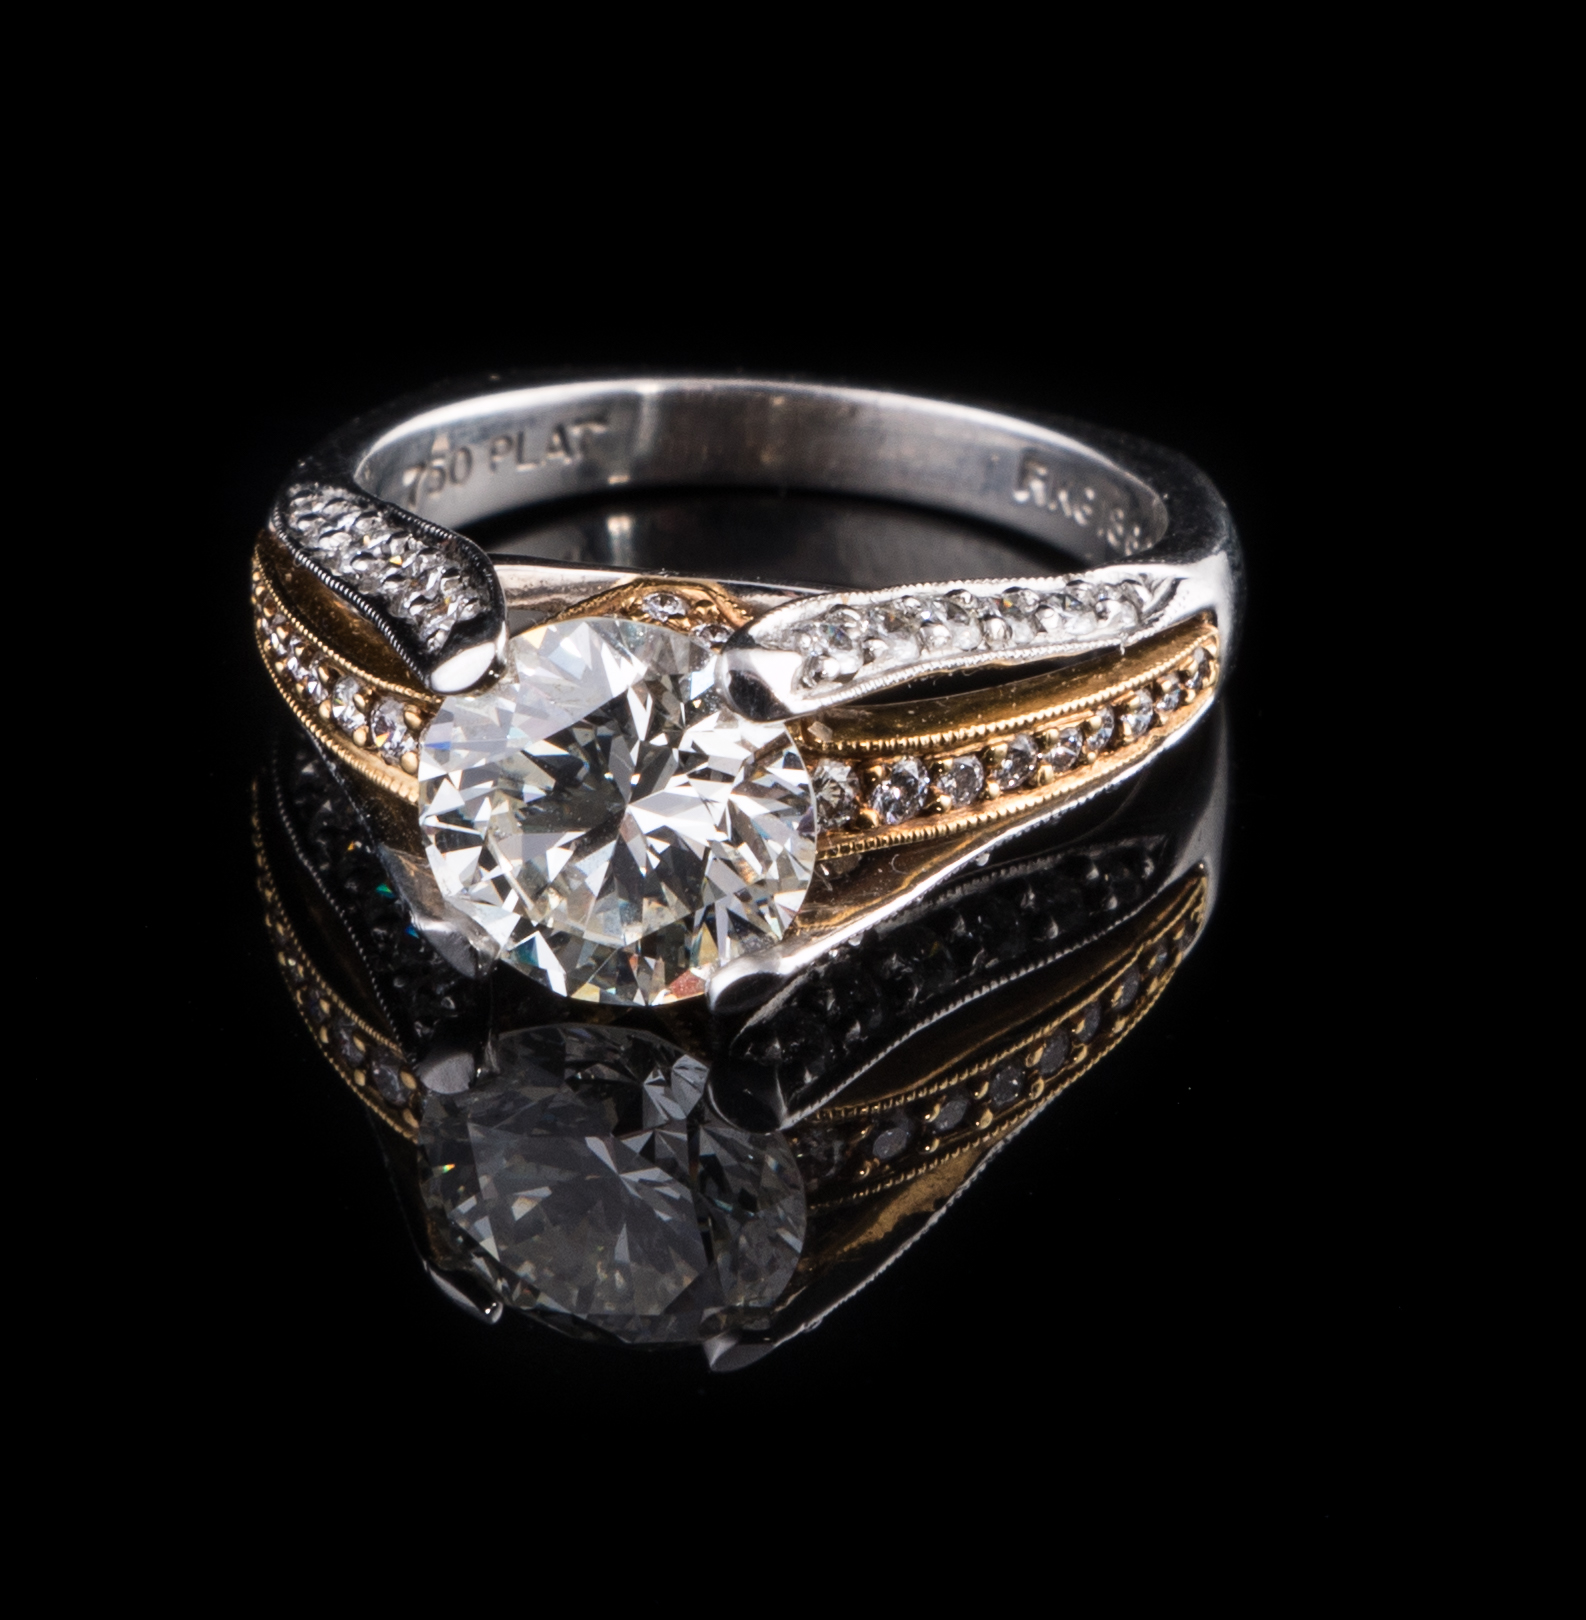 18kt yellow gold and platinum ring with 2 carat center Diamond and .50 carat accent Diamonds.jpg